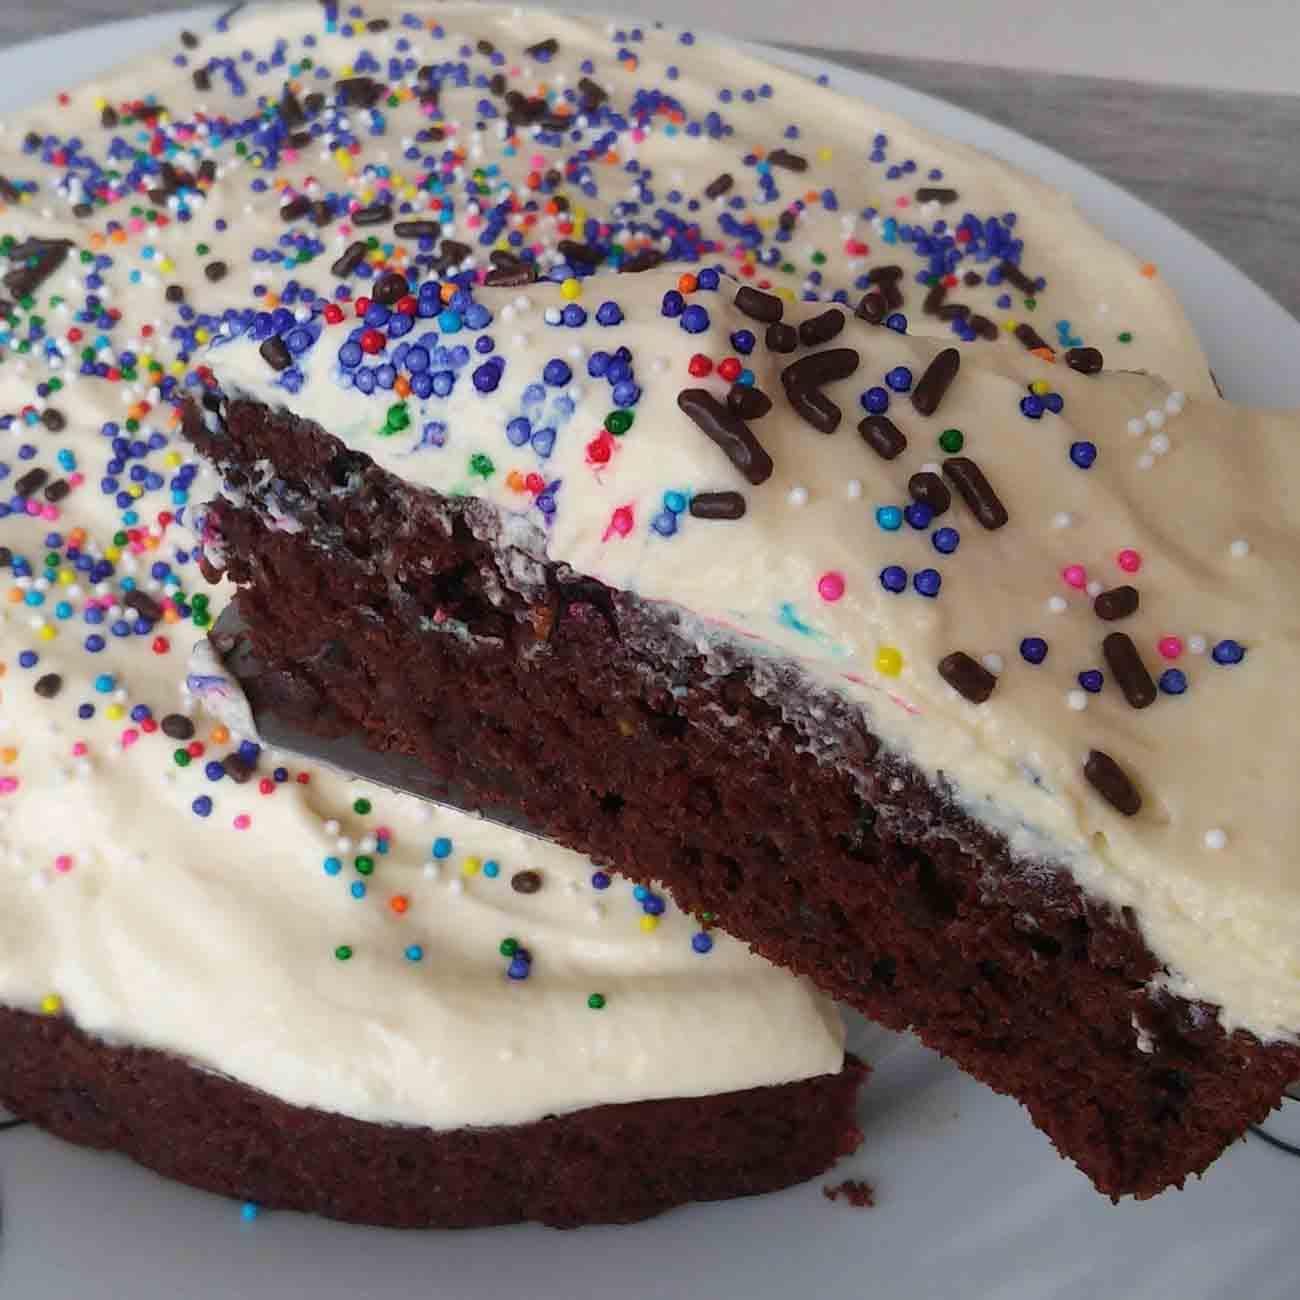 Healthy-ish Chocolate Cake Recipe